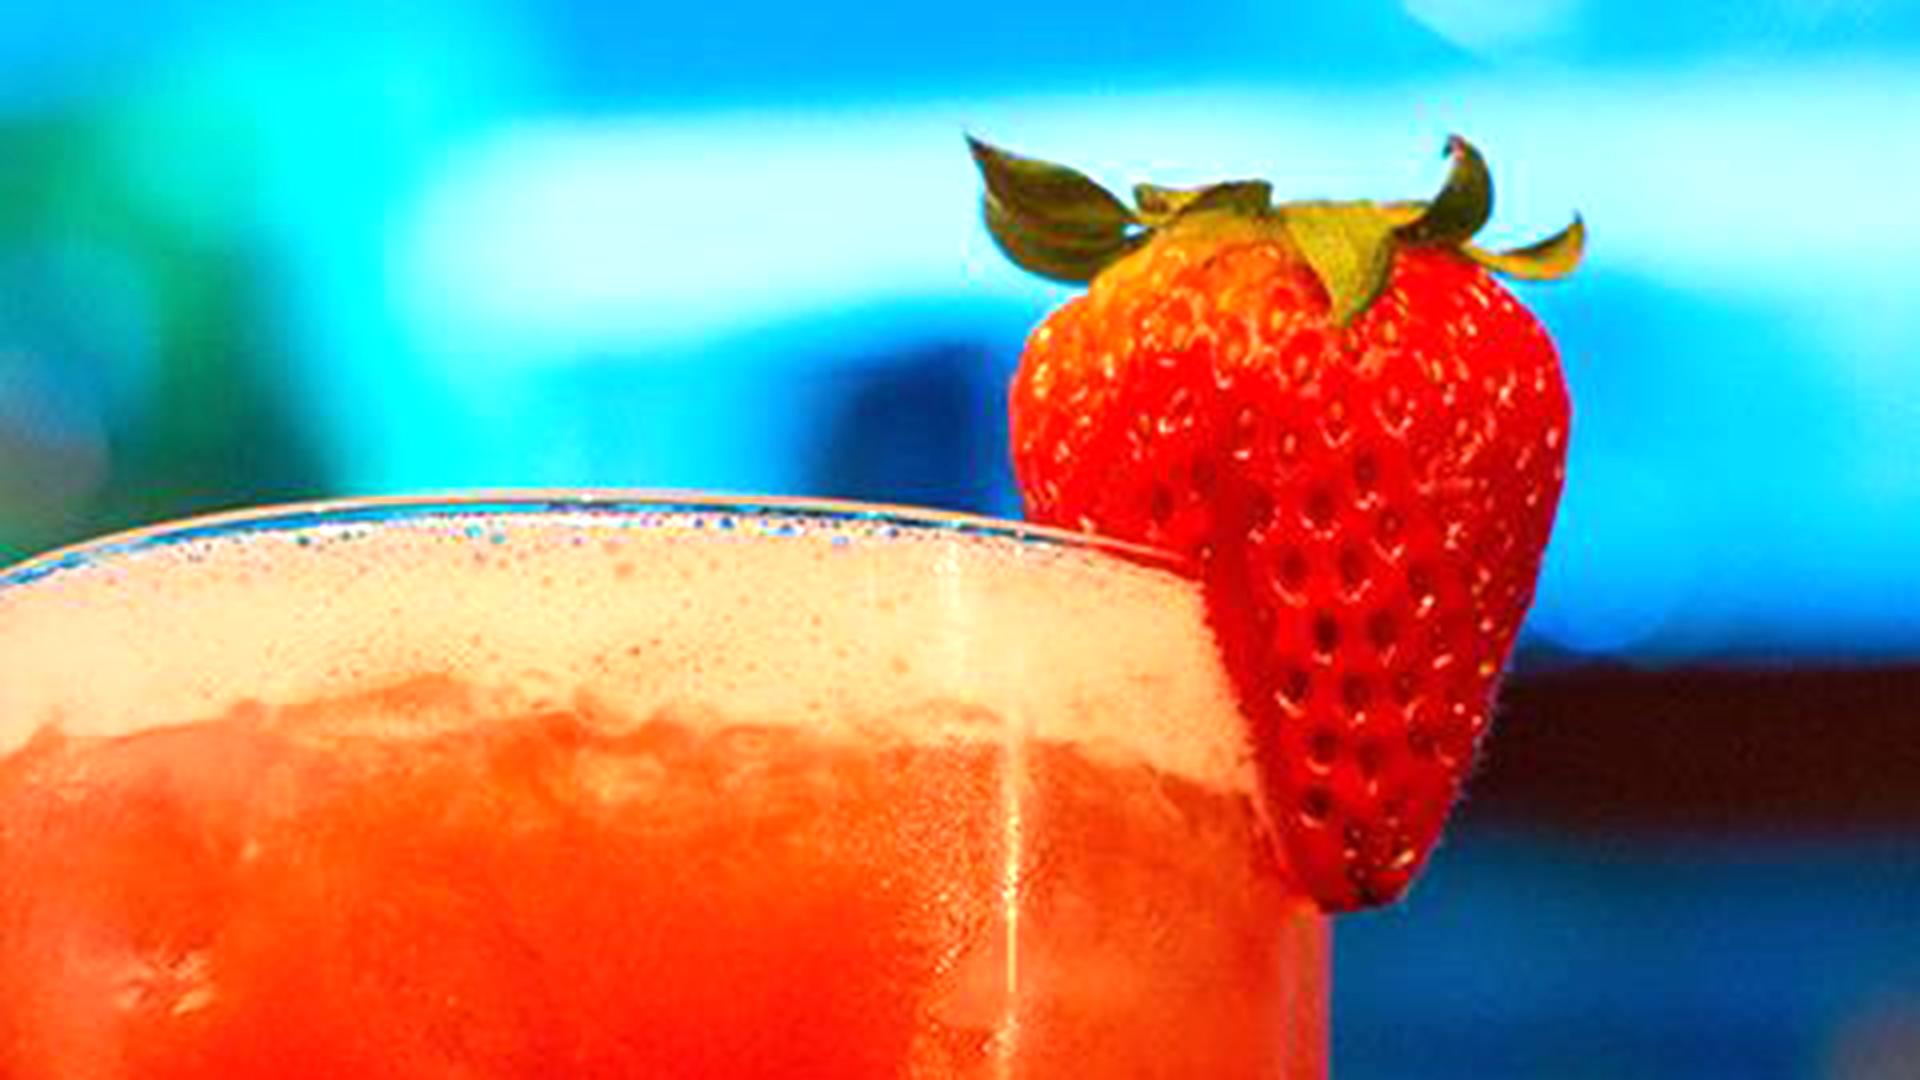 3-Ingredient Strawberry Margarita - TODAY.com